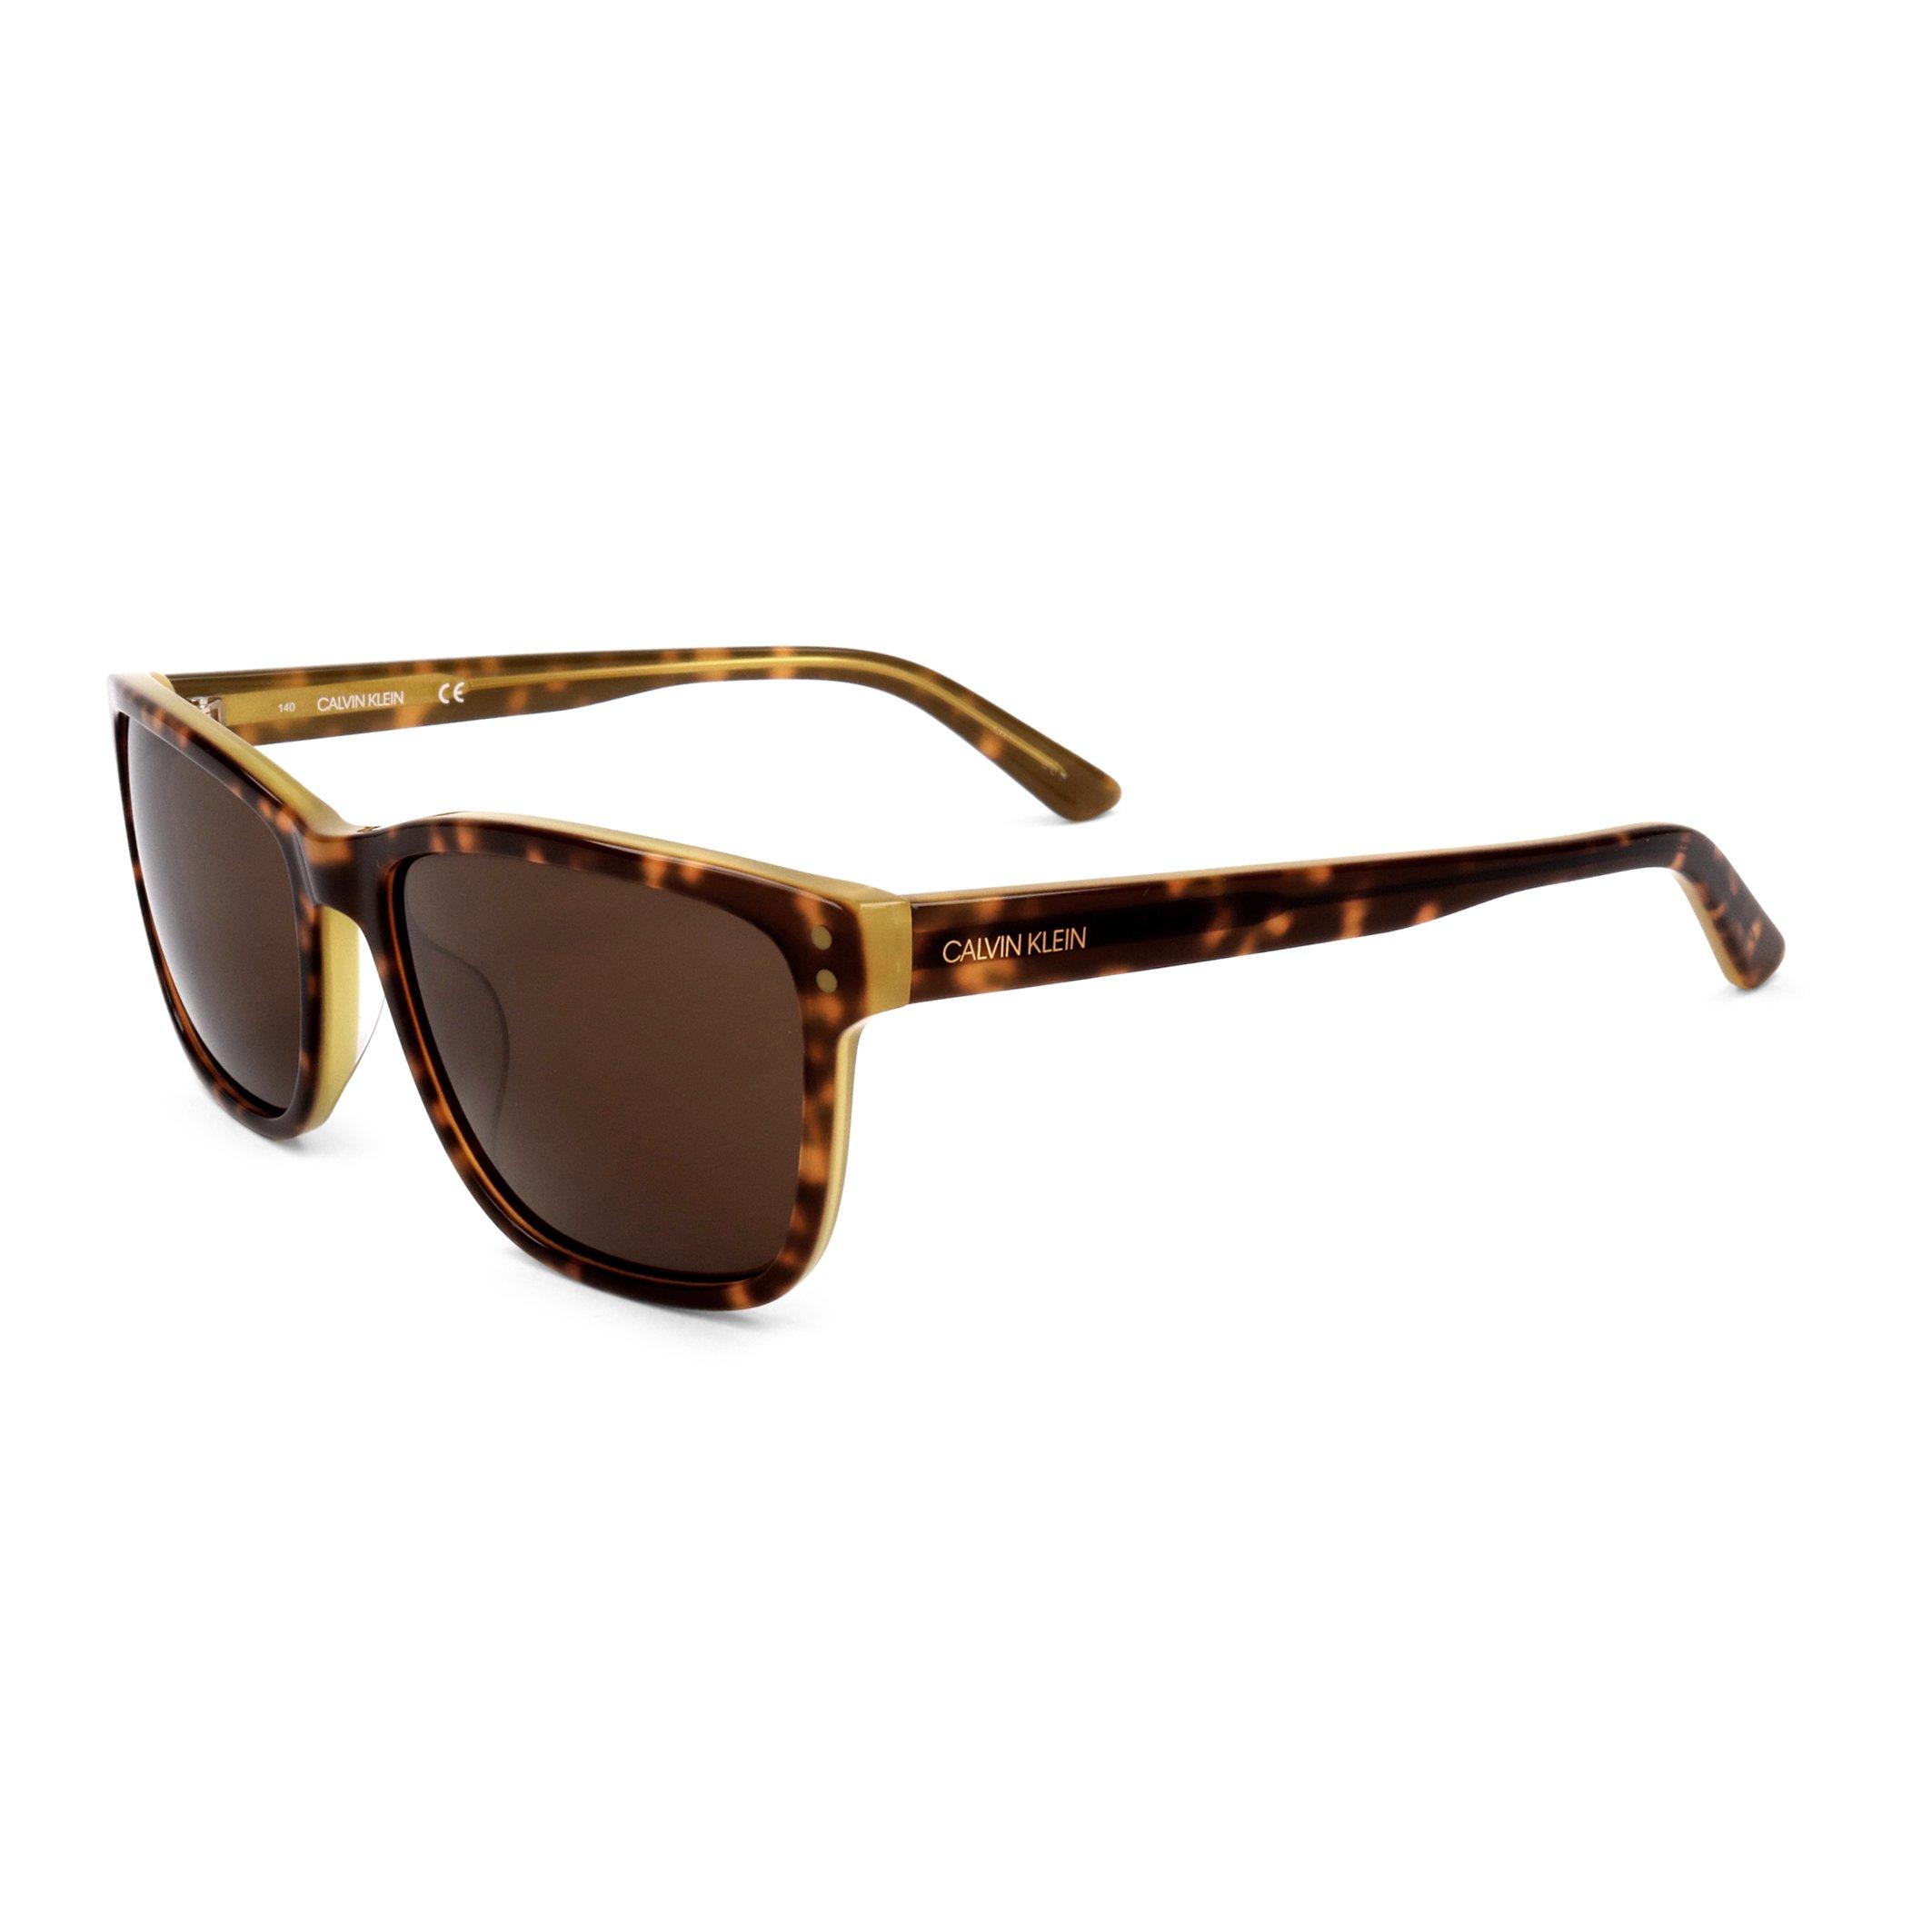 Calvin Klein Men's Sunglasses Various Colours CK18508S - brown NOSIZE